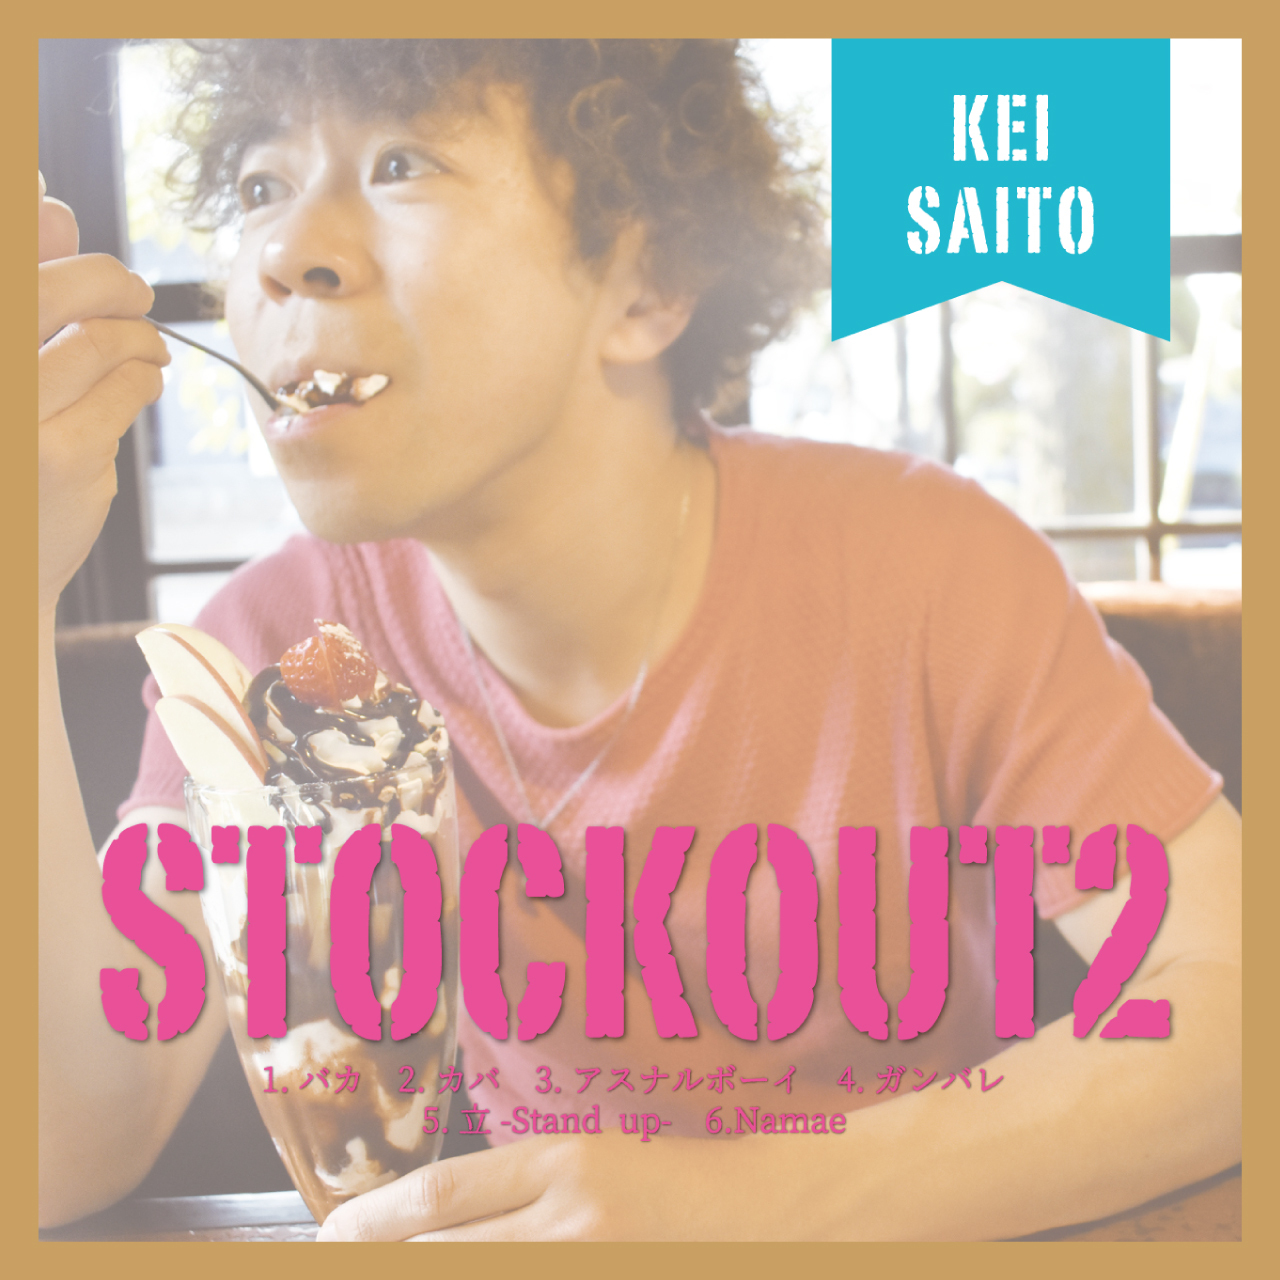 STOCKOUT2